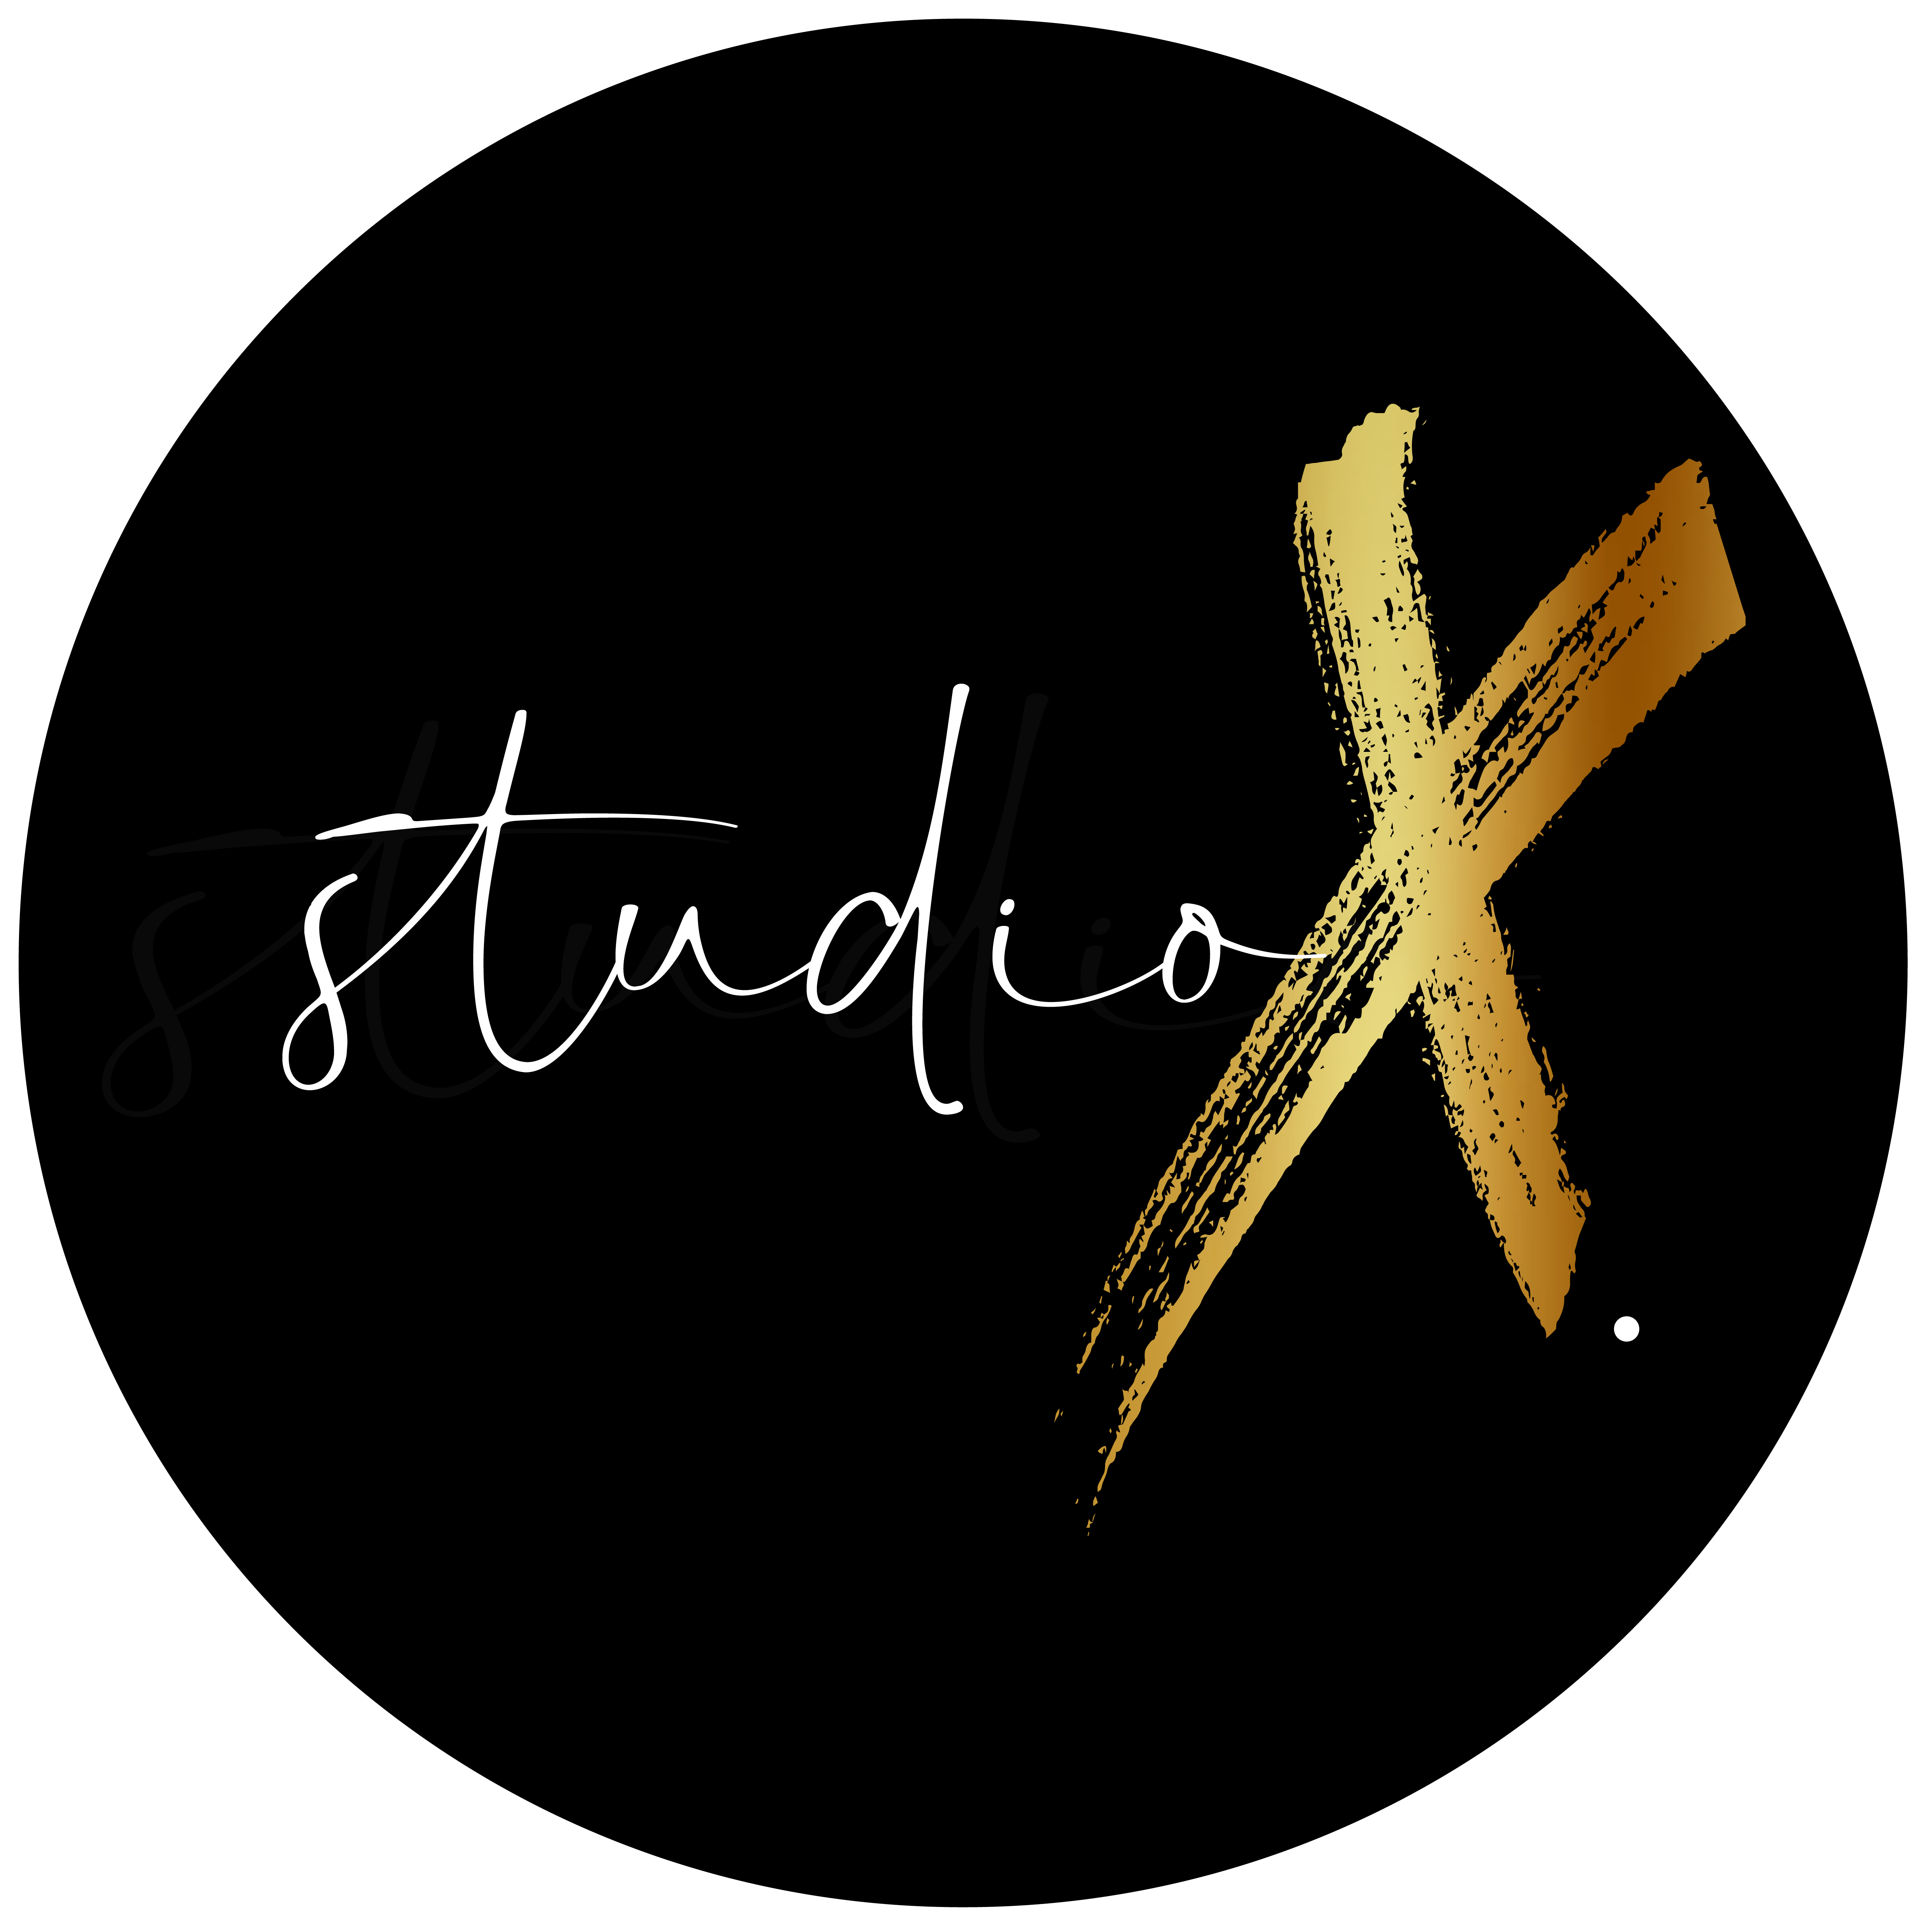 studioX__black___1_